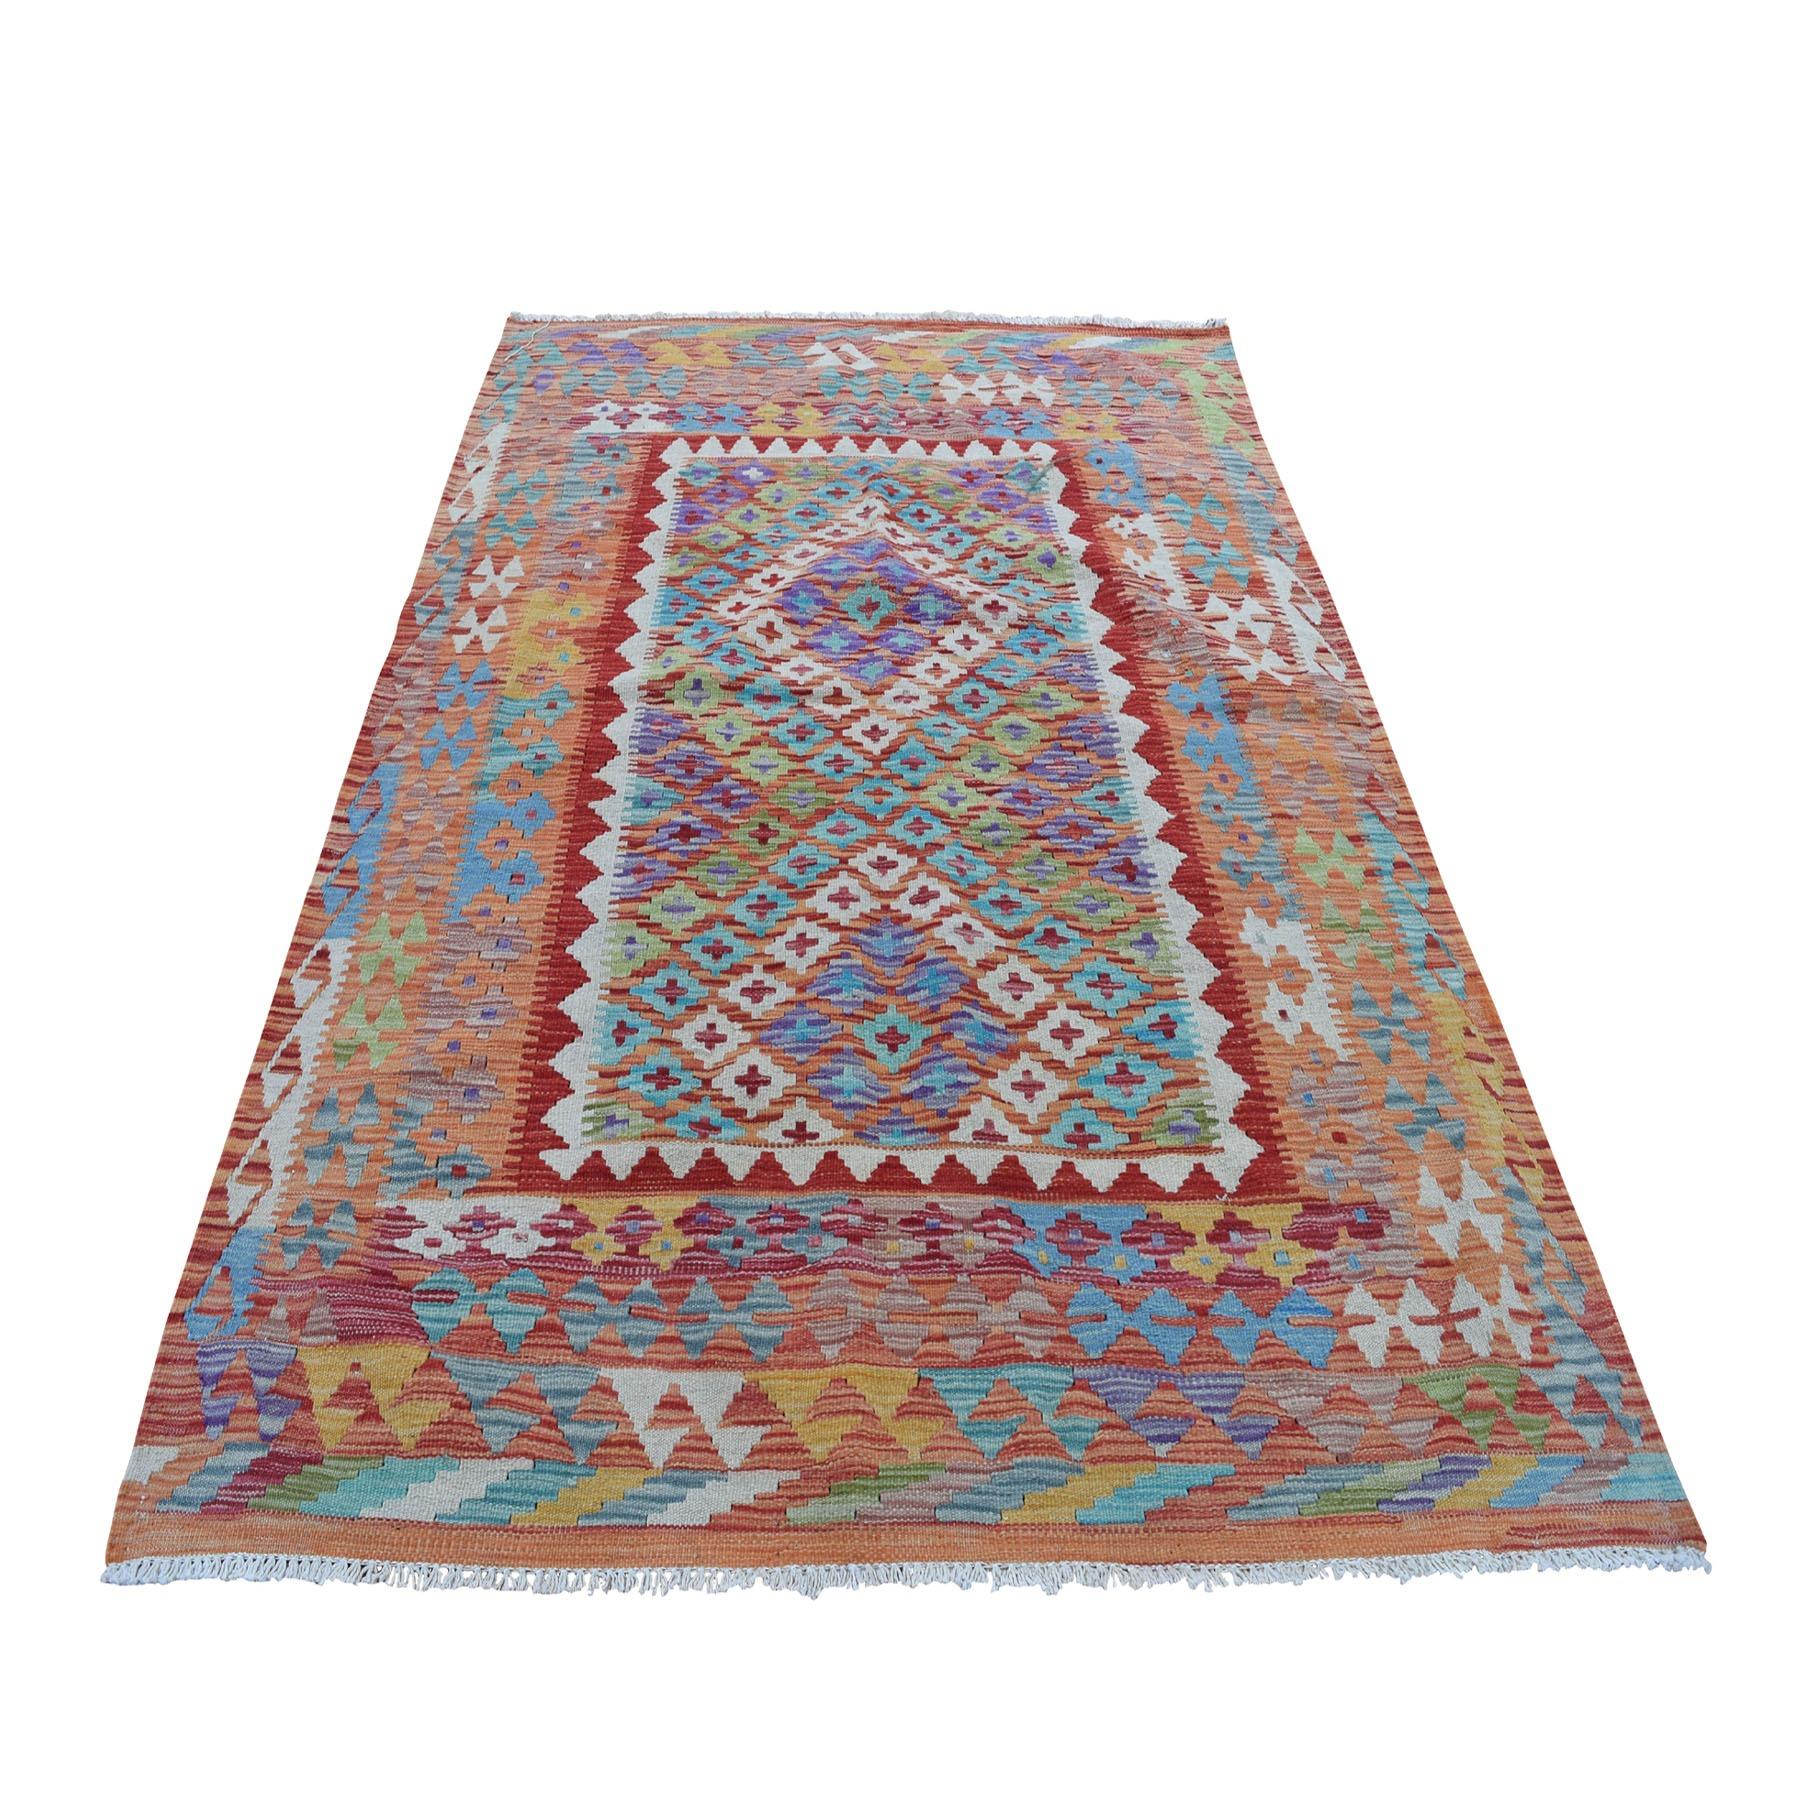 "4'3""x5'8"" Colorful Afghan Kilim Pure Wool Hand Woven Oriental Rug"